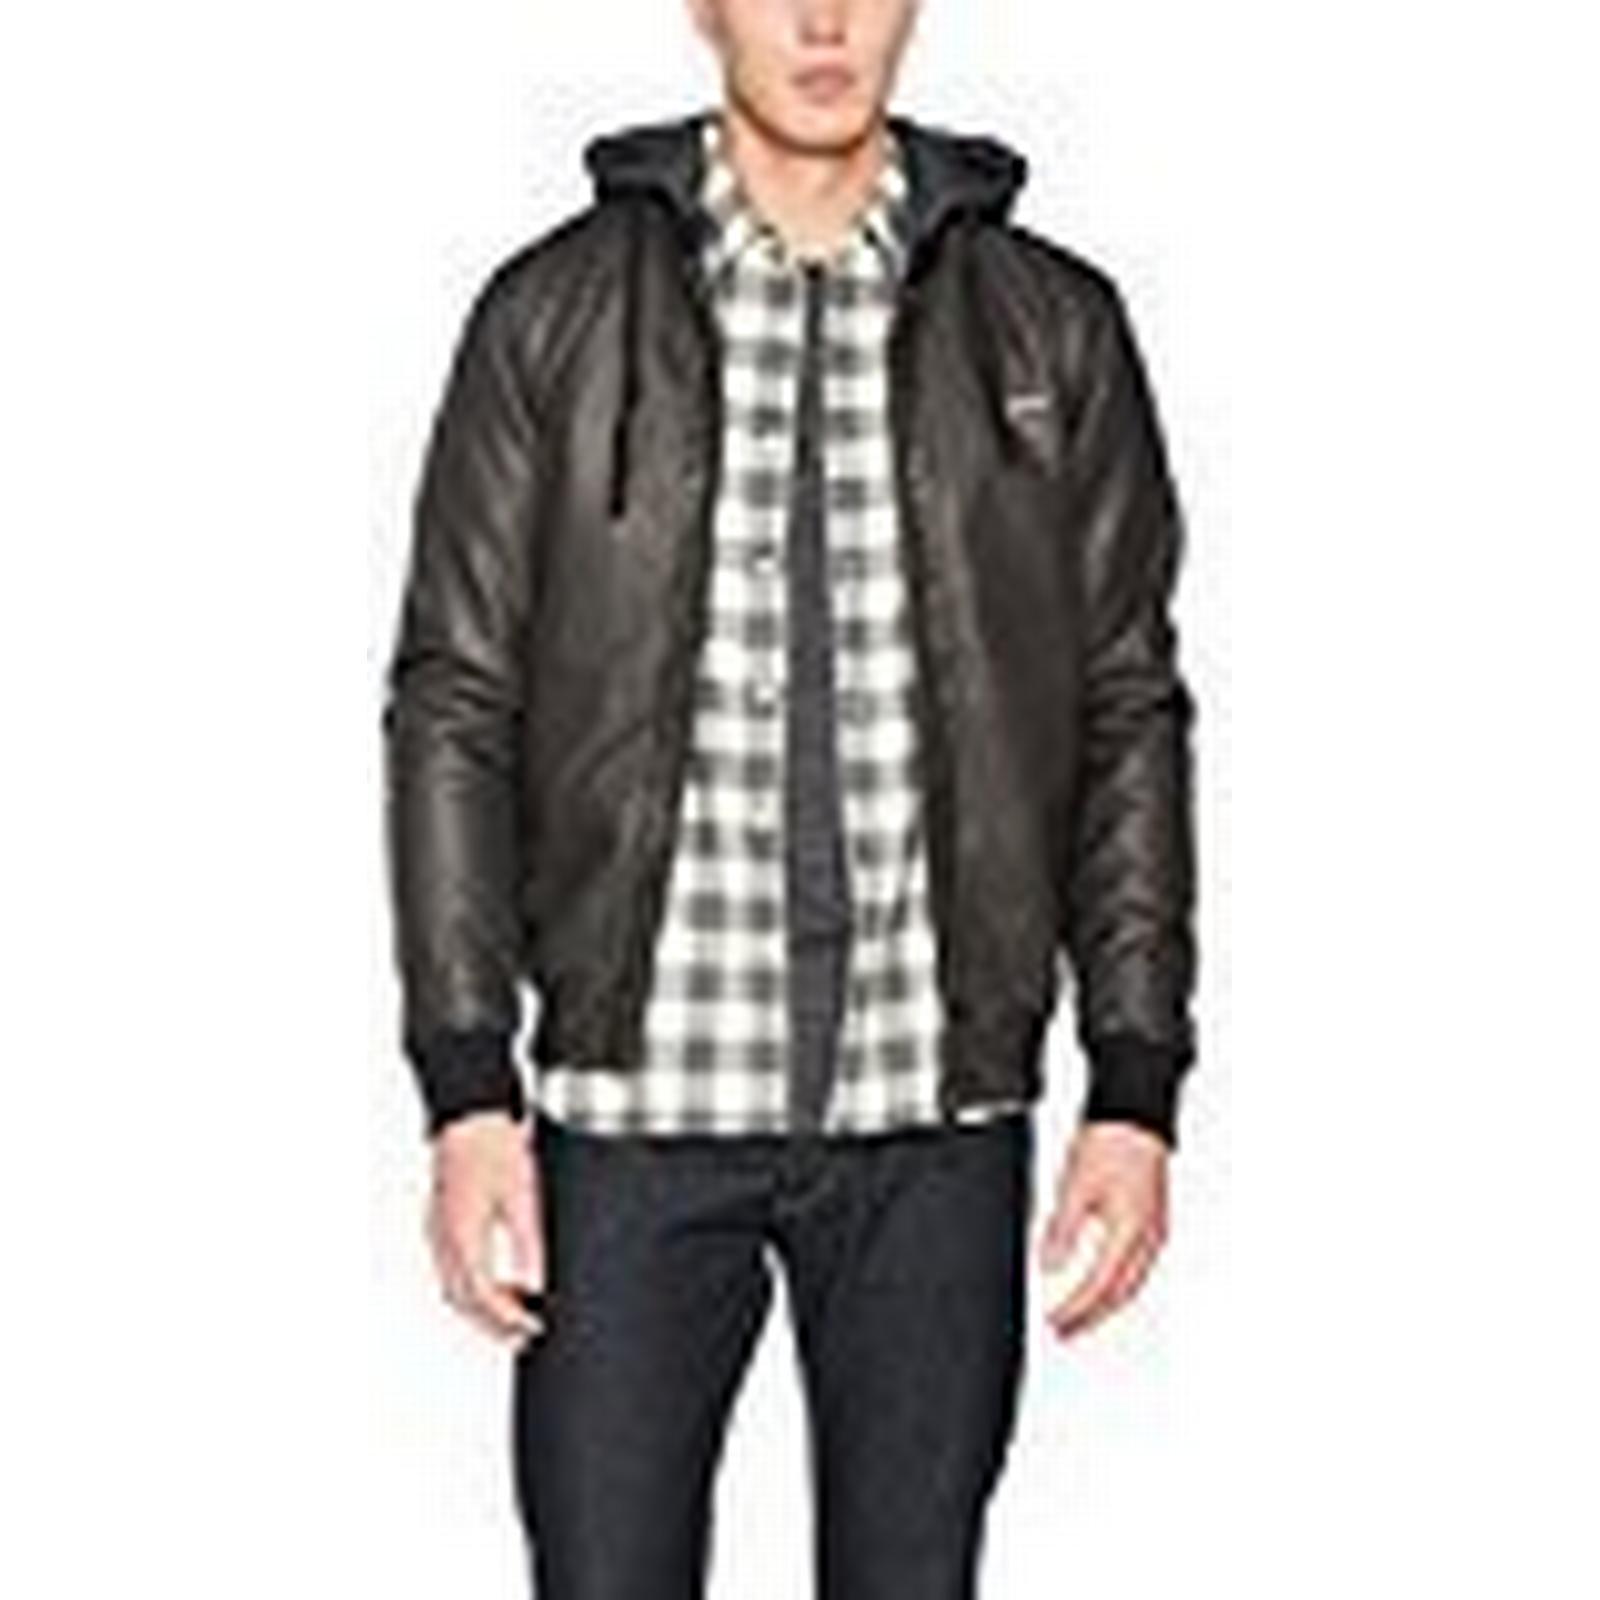 Billabong Futur Proof, Men's Vintage Jacket, Men's, Futur Proof, Vintage Men's Black, M a3c90e